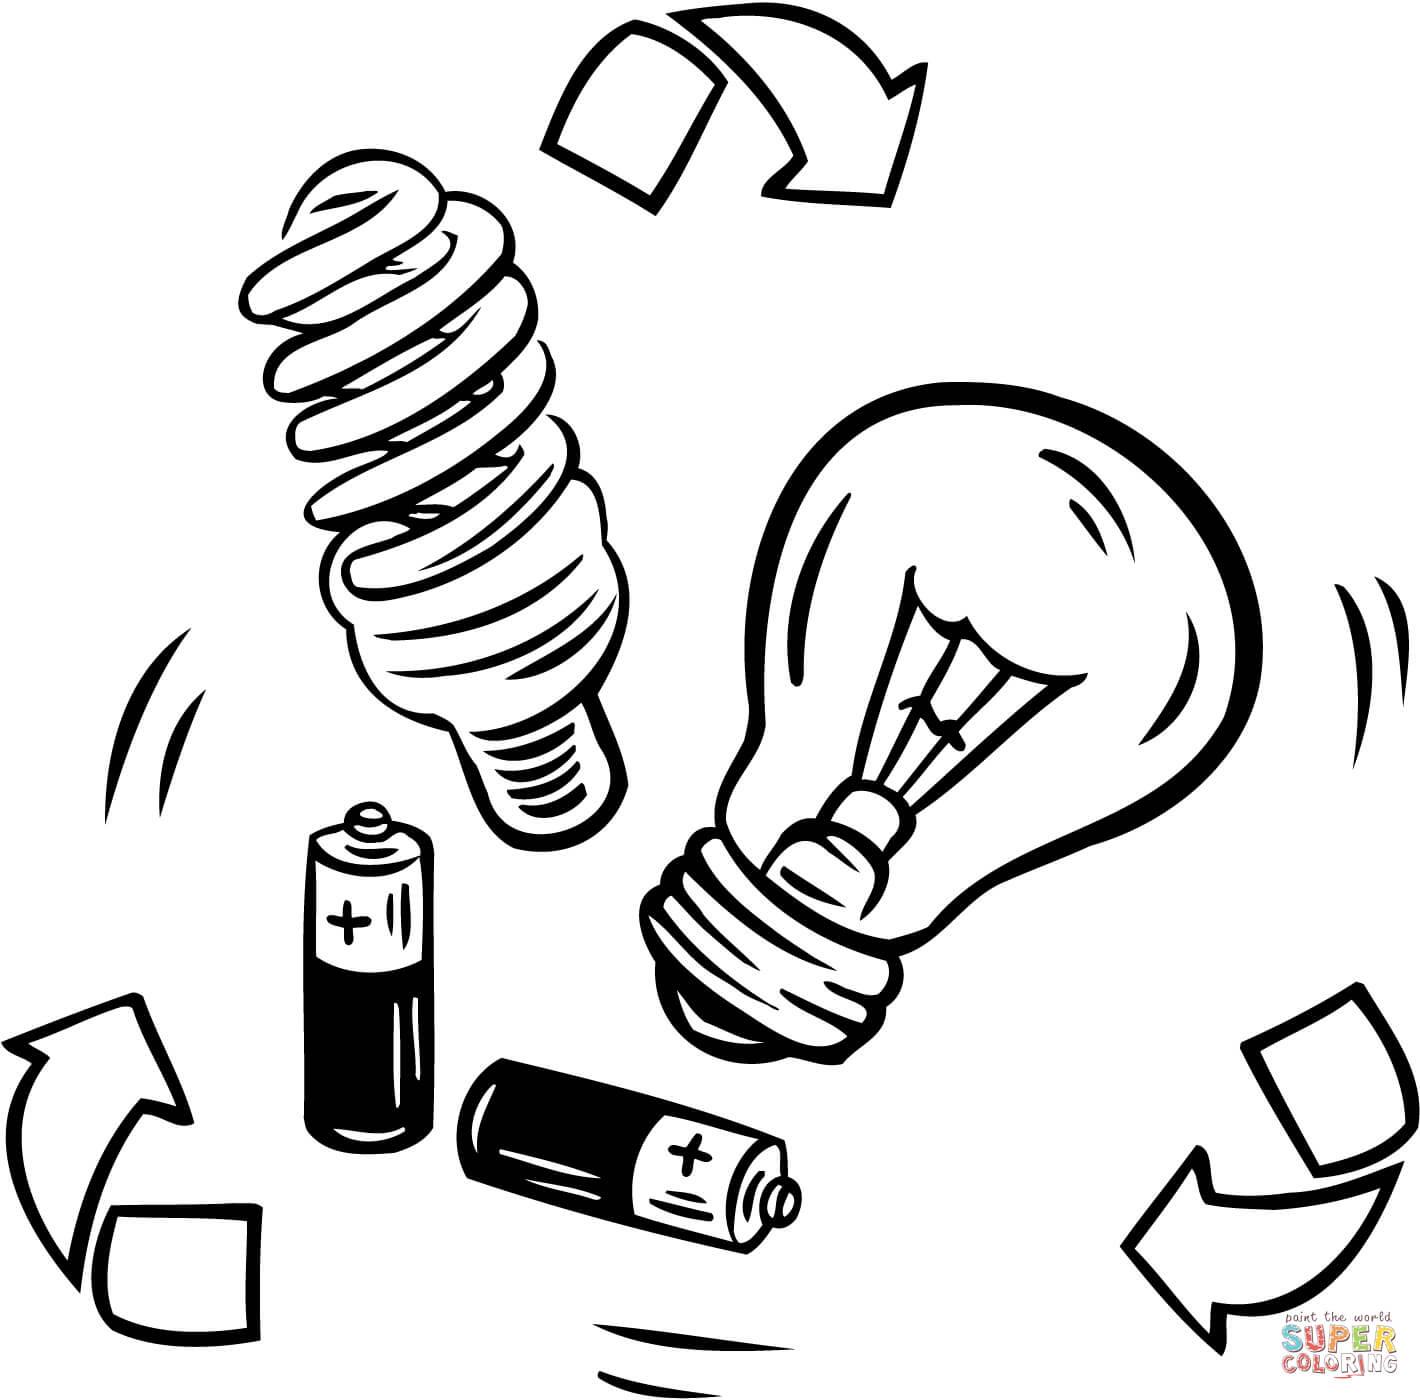 1420x1400 Drawn Bulb Colouring Page